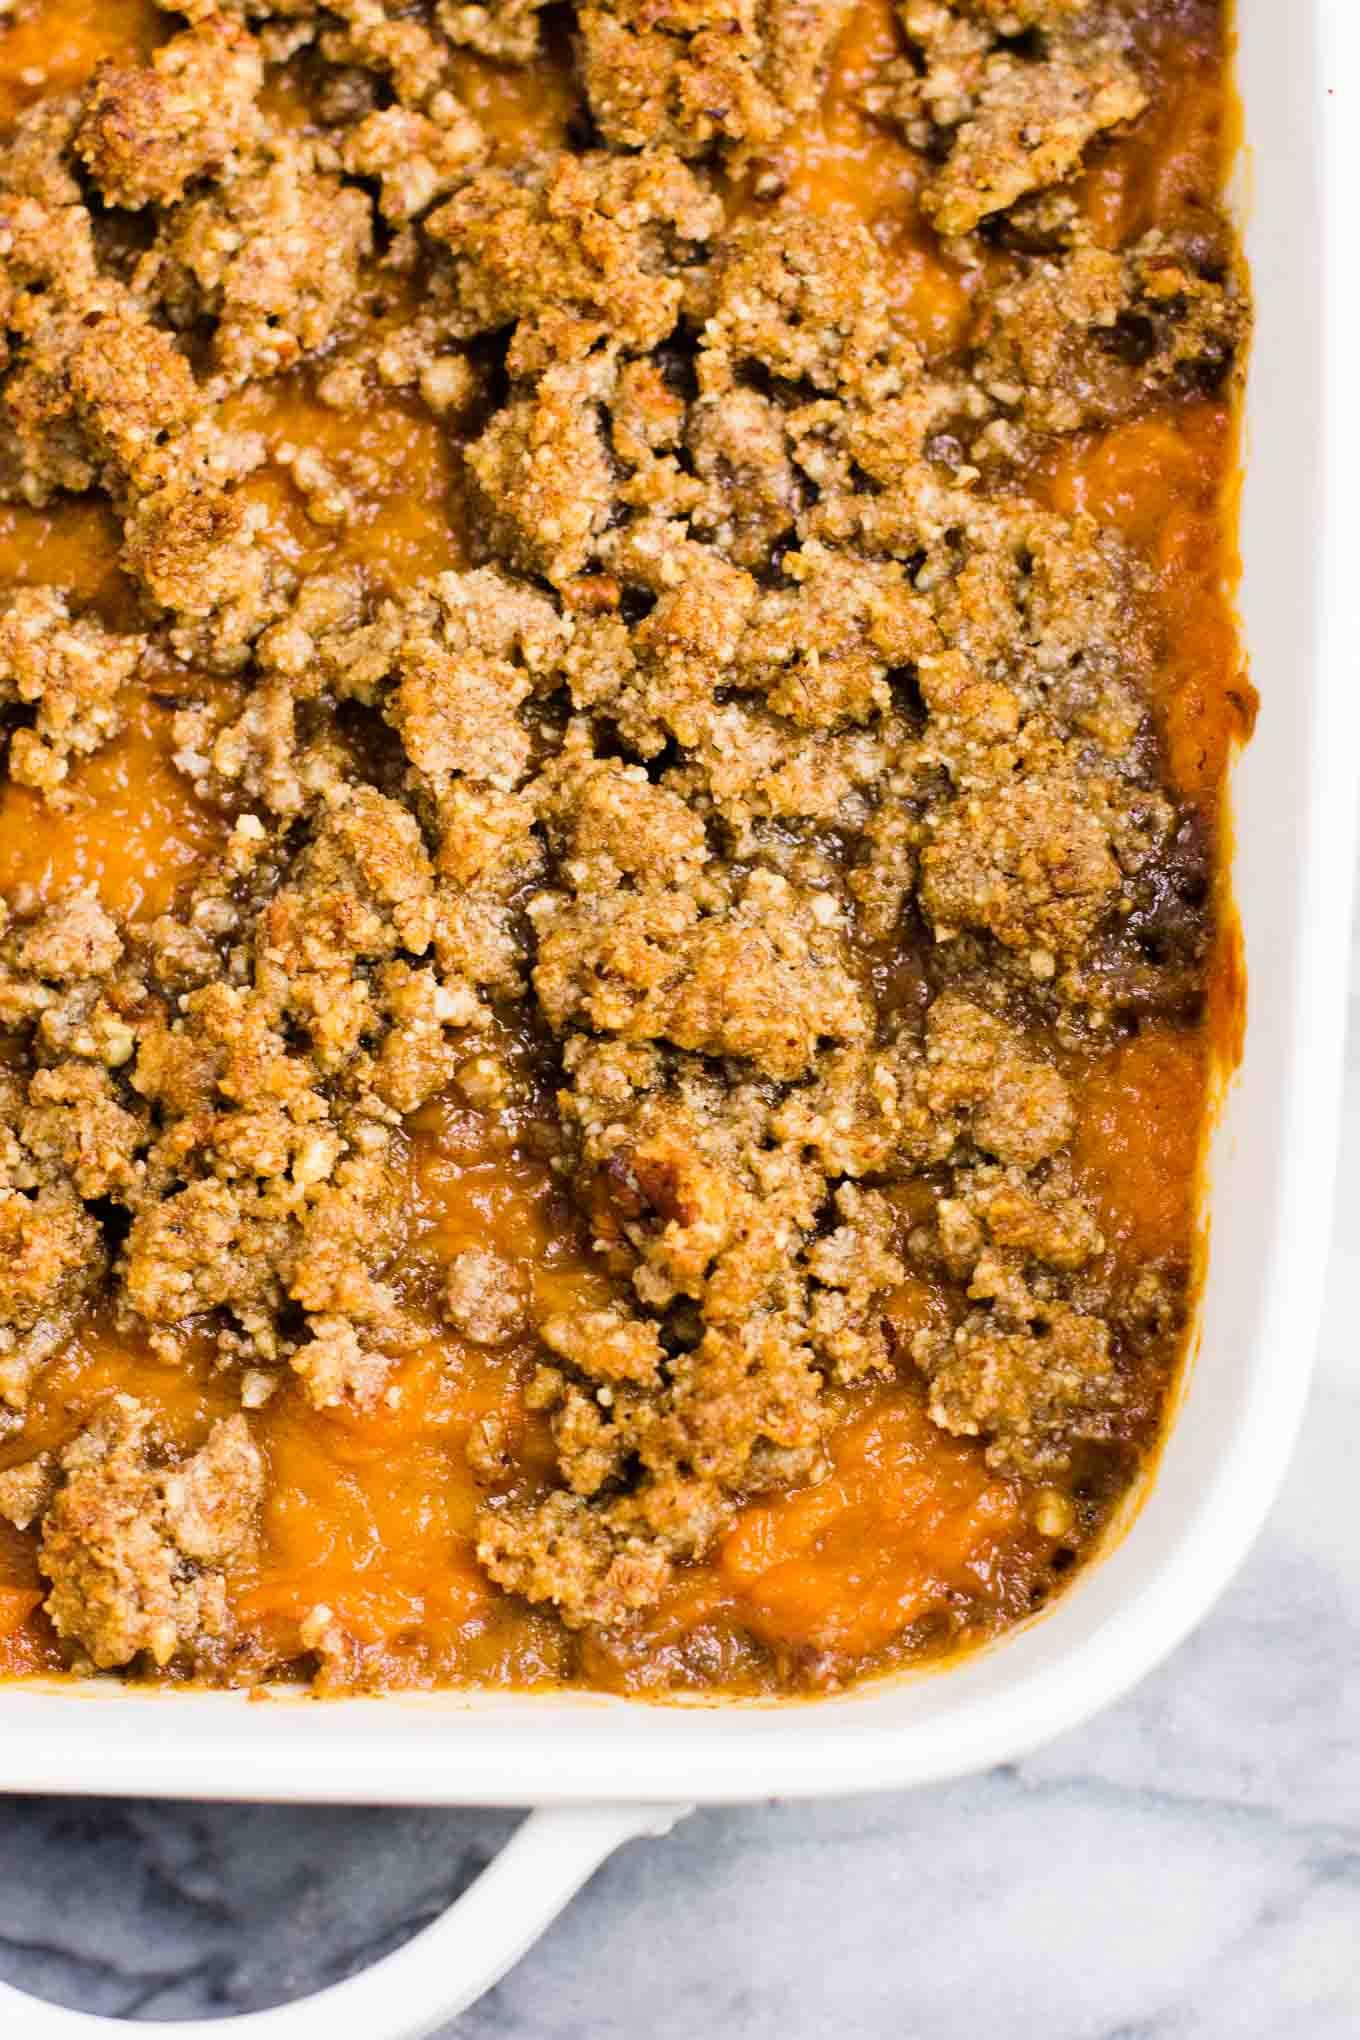 Vegan Sweet Potato Casserole With Pecan Crumble